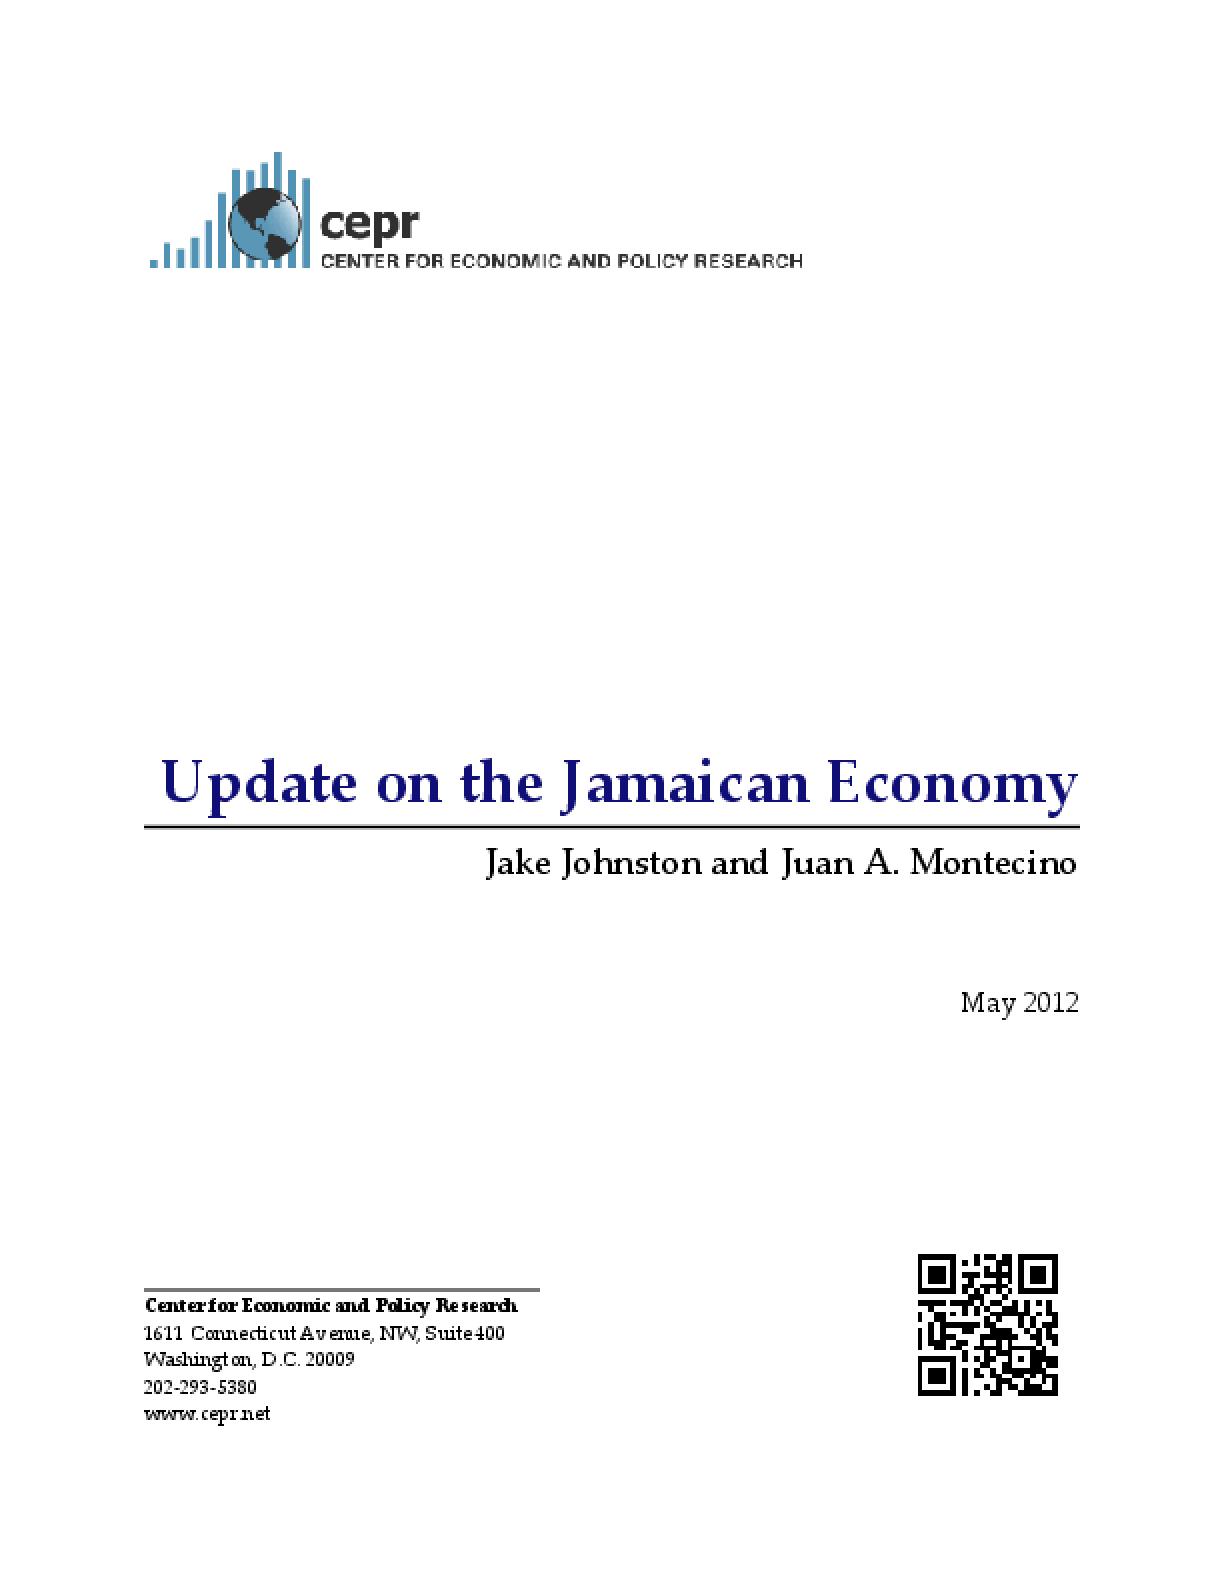 Update on the Jamaican Economy